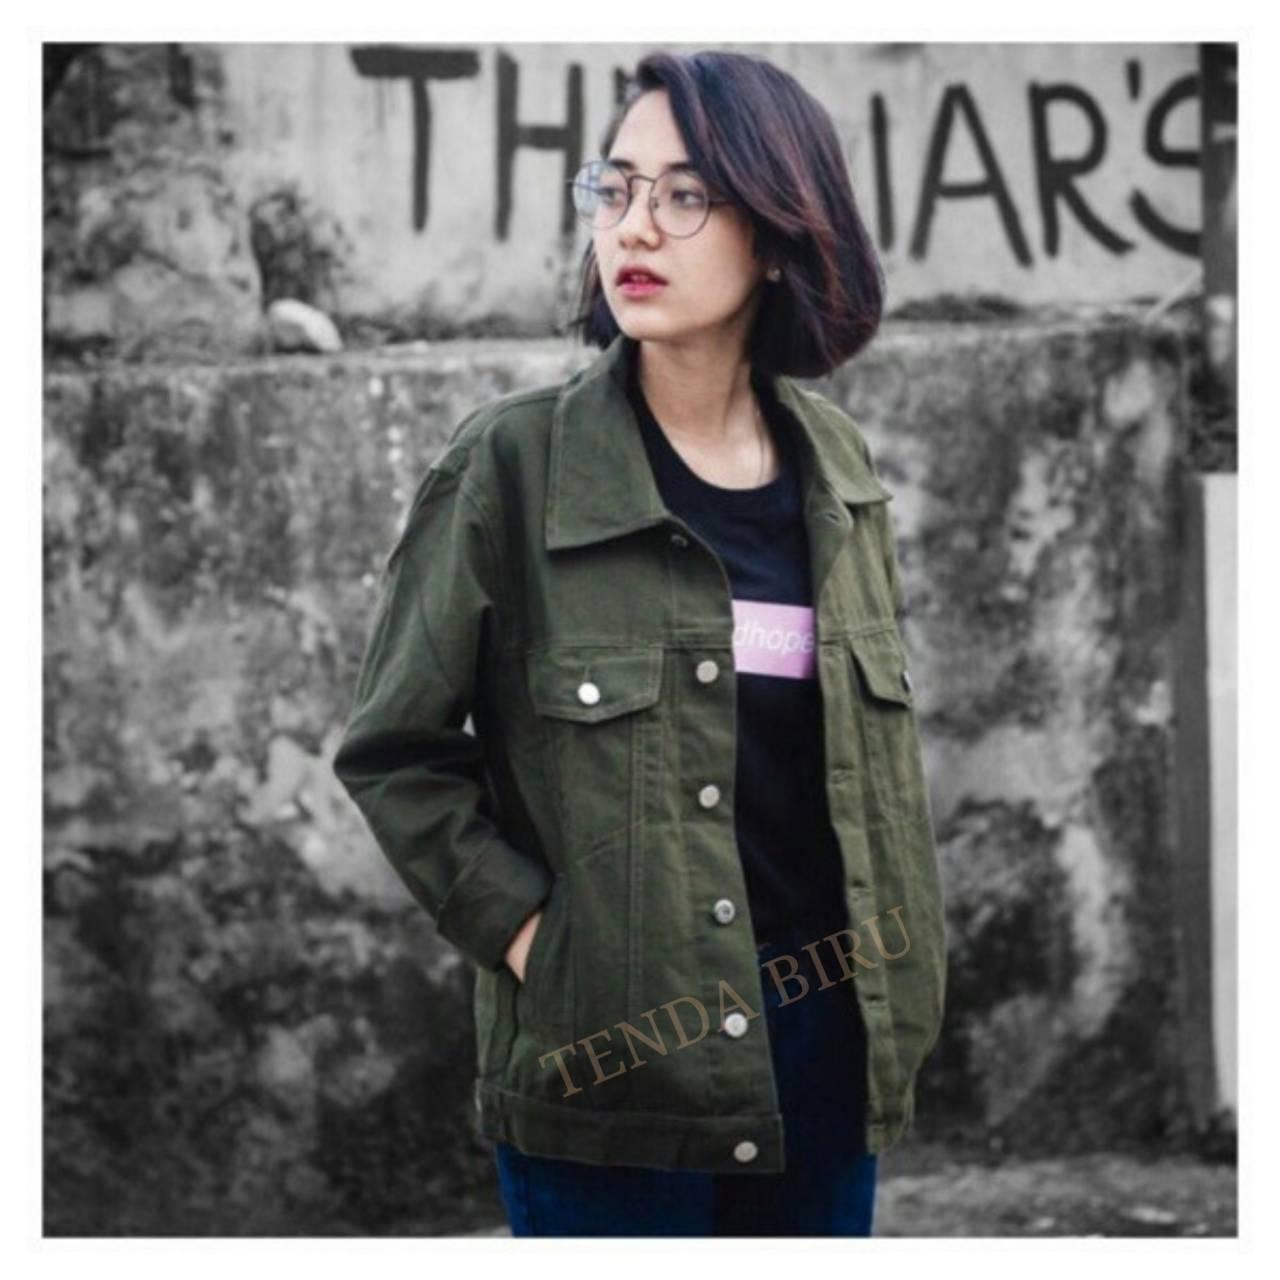 Jaket Mantel Wanita Terbaik Lazada Parka Waterproof Terlaris Baru  Brand Original Blessher New Tenda Jacket Jeans Denim Trendy Oversize